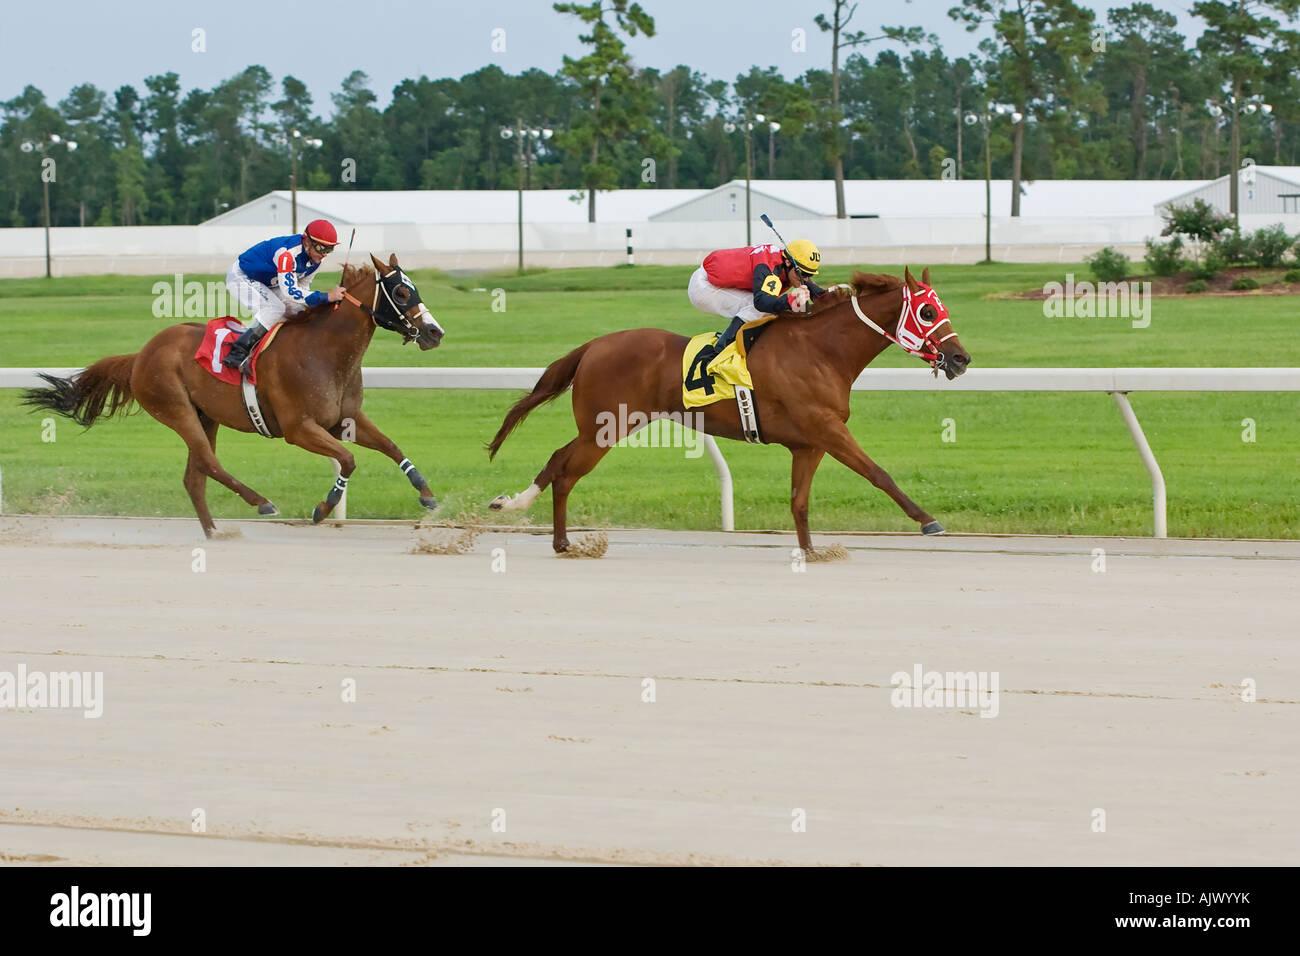 Quarter Horse Racing - Stock Image